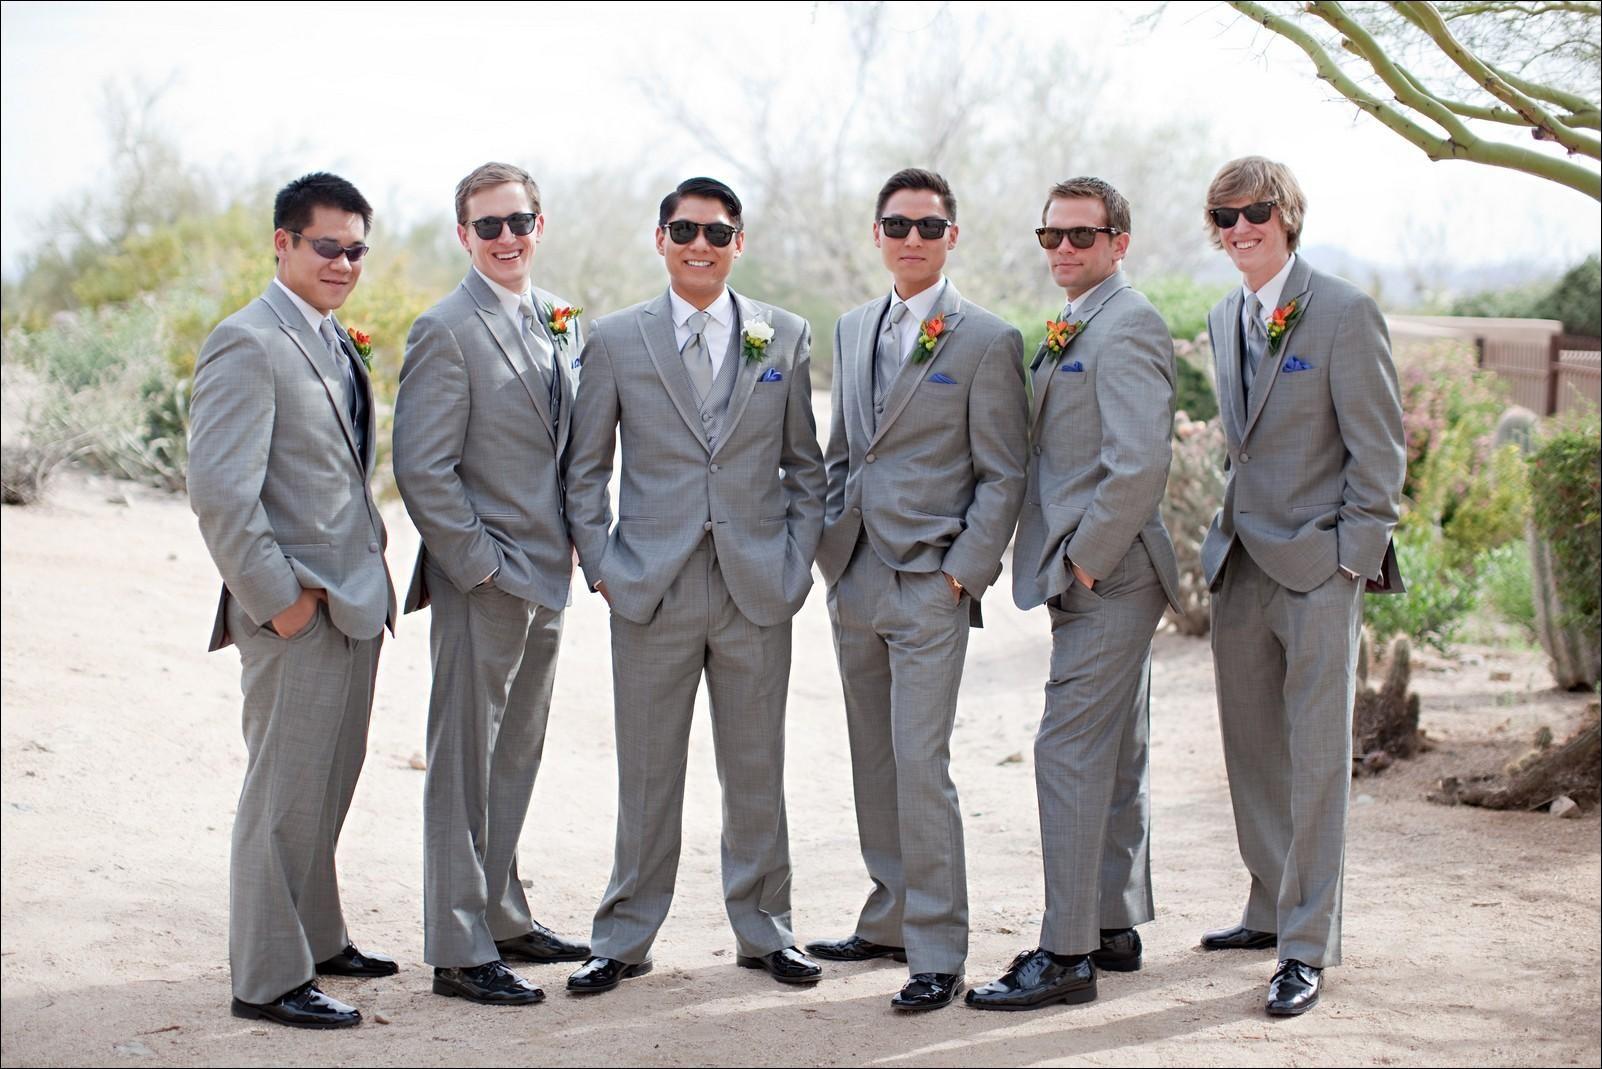 Mens Grey Suit Wedding - Go Suits